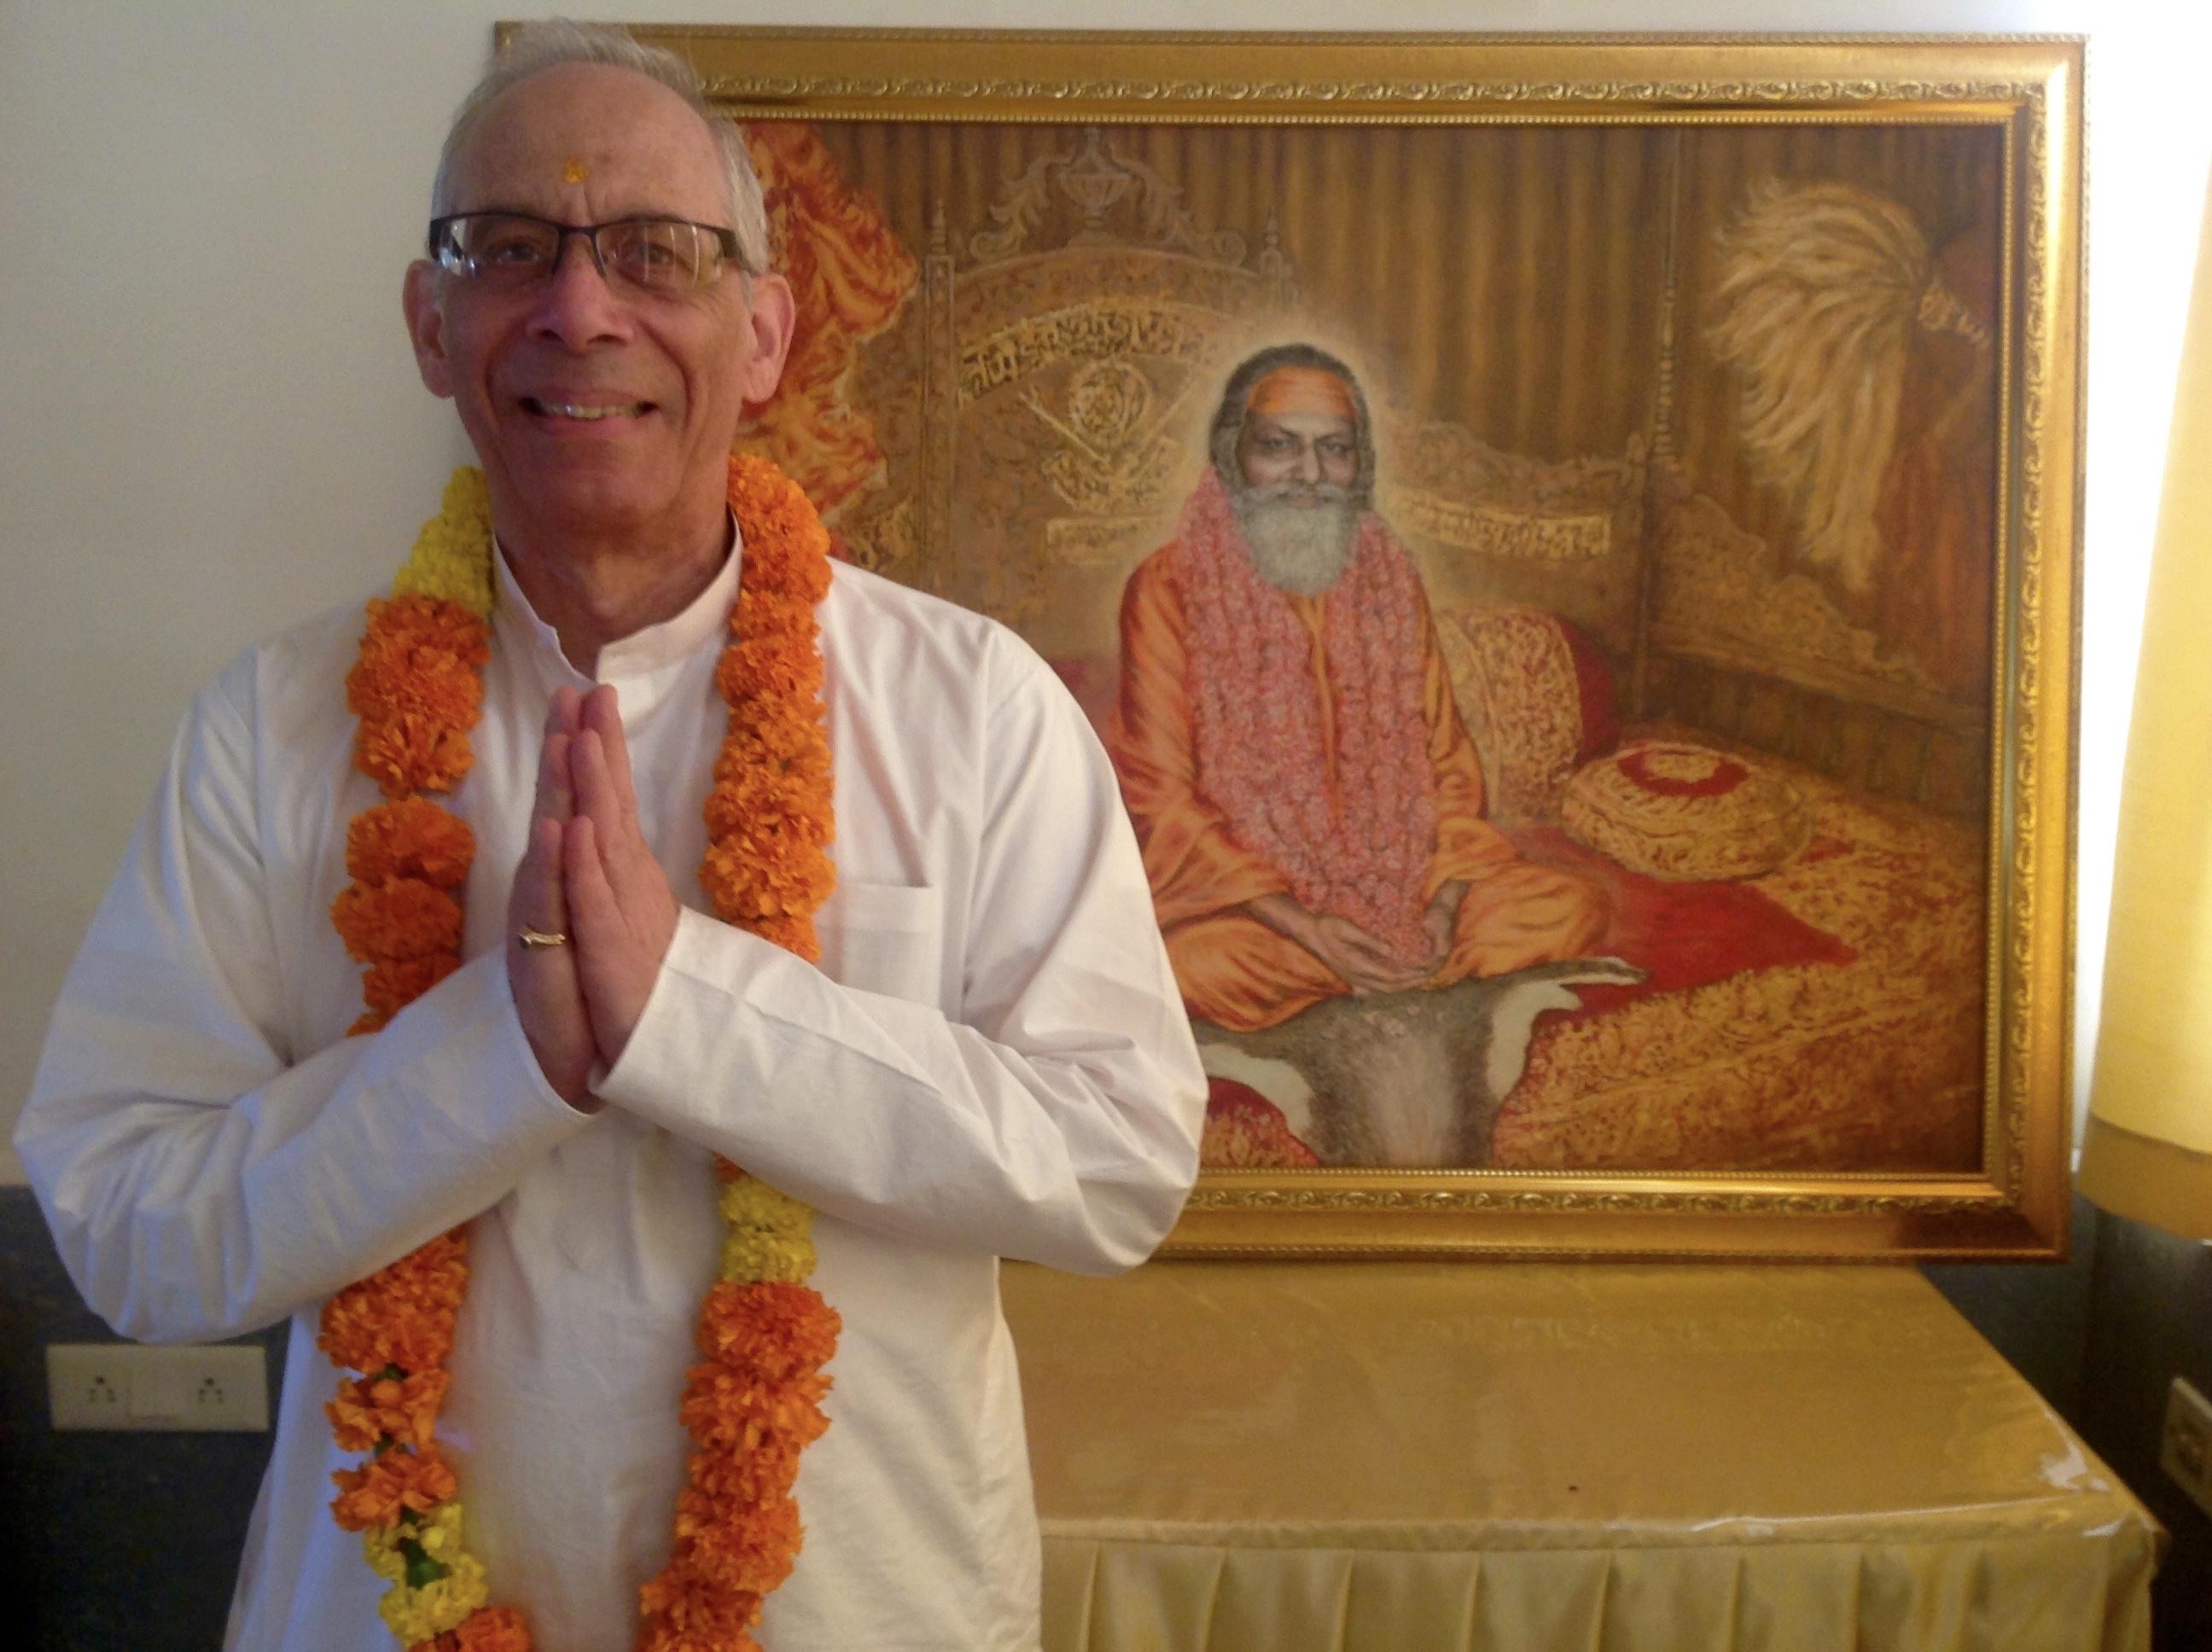 Kenny at the Brahmasthan Nov 16, 2016